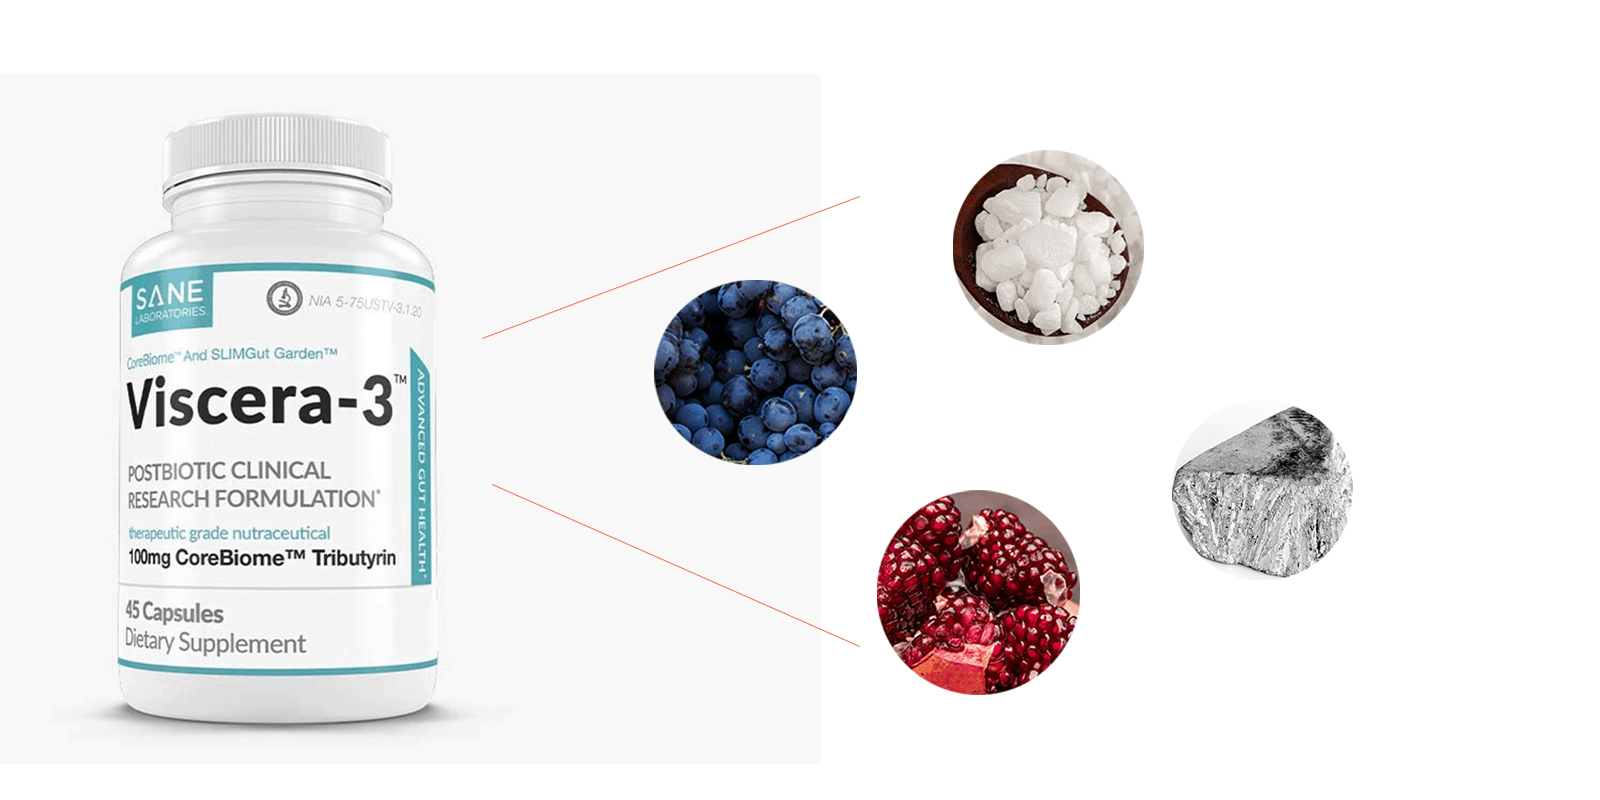 Viscera-3 ingredients